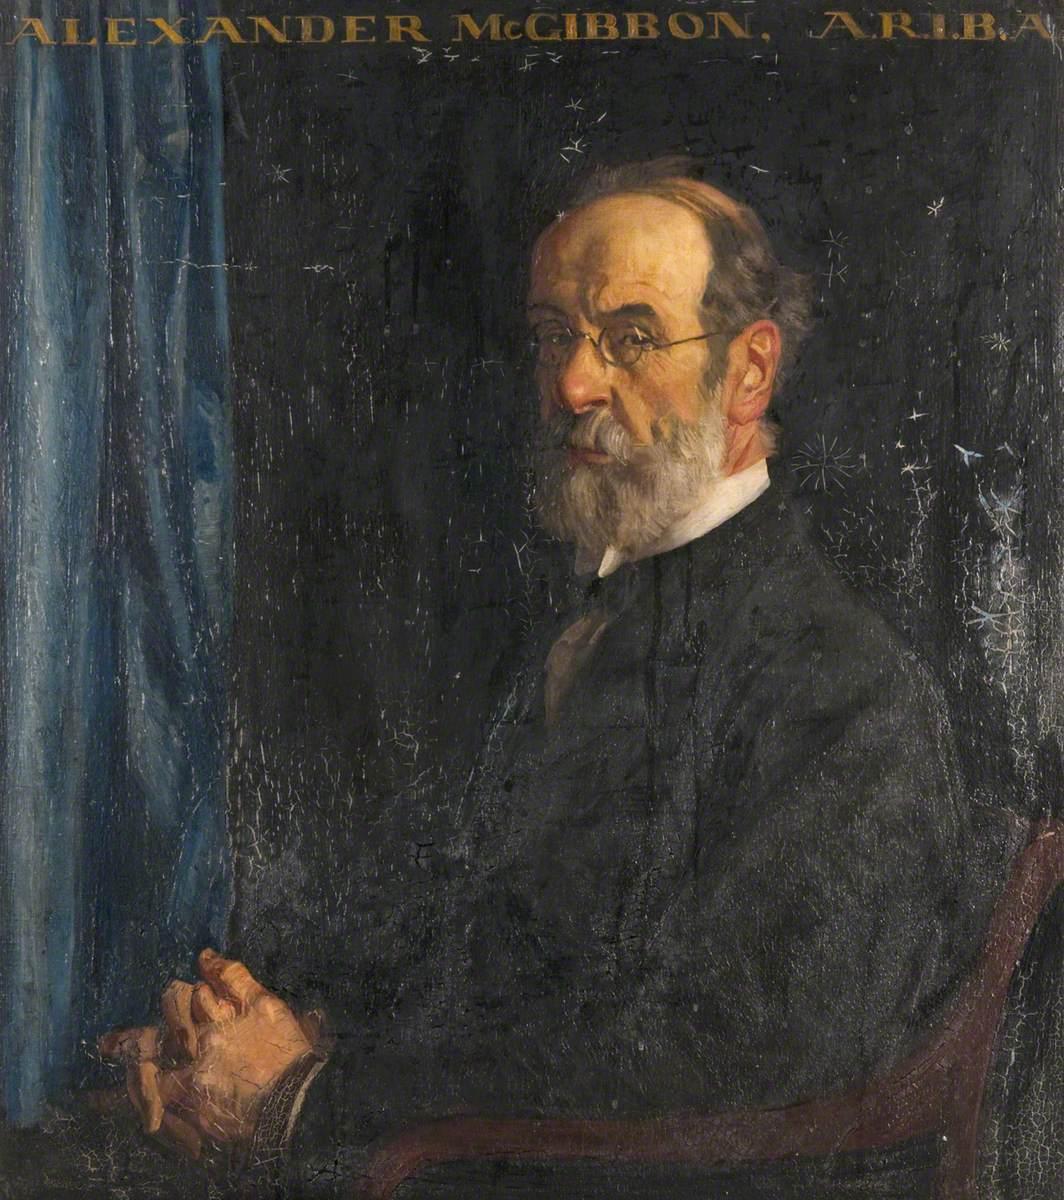 Alexander McGibbon, ARIBA